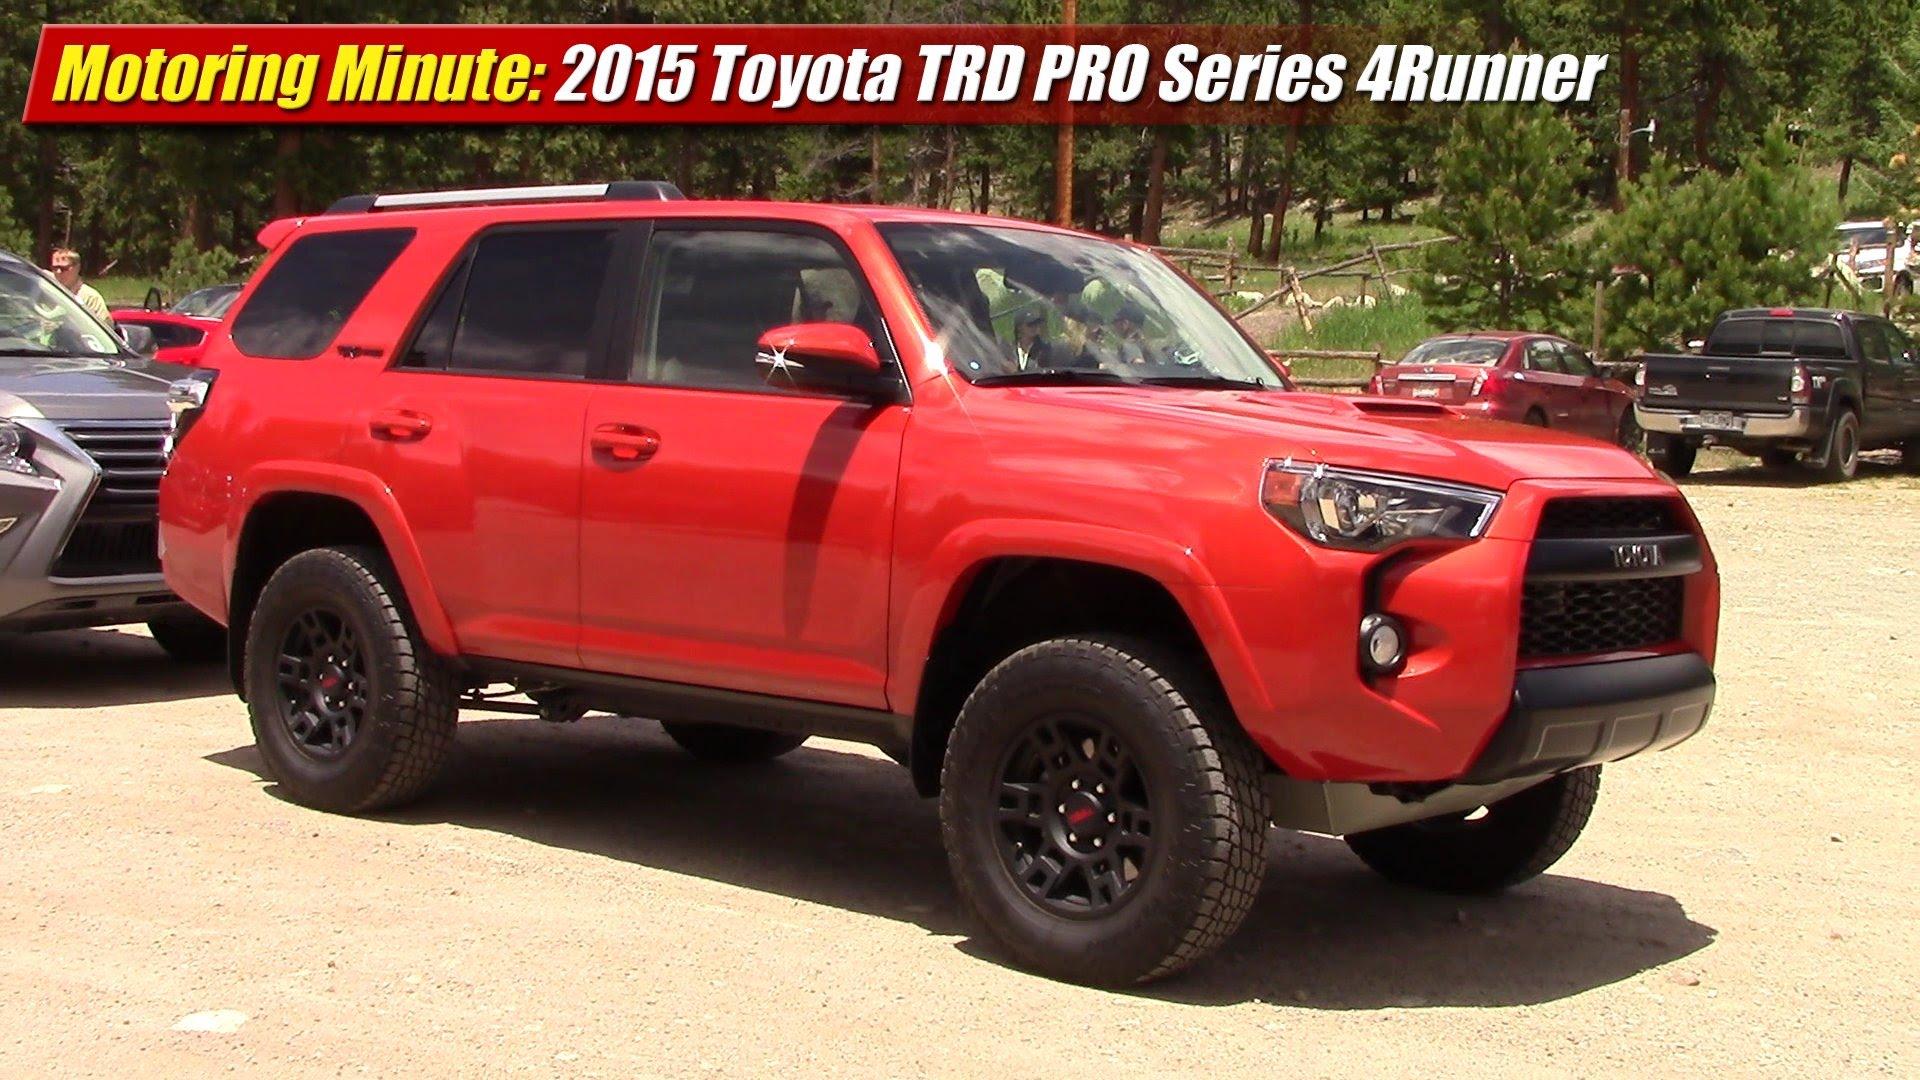 Motoring Minute First Look 2015 Toyota Trd Pro Series 4runner Testdriven Tv